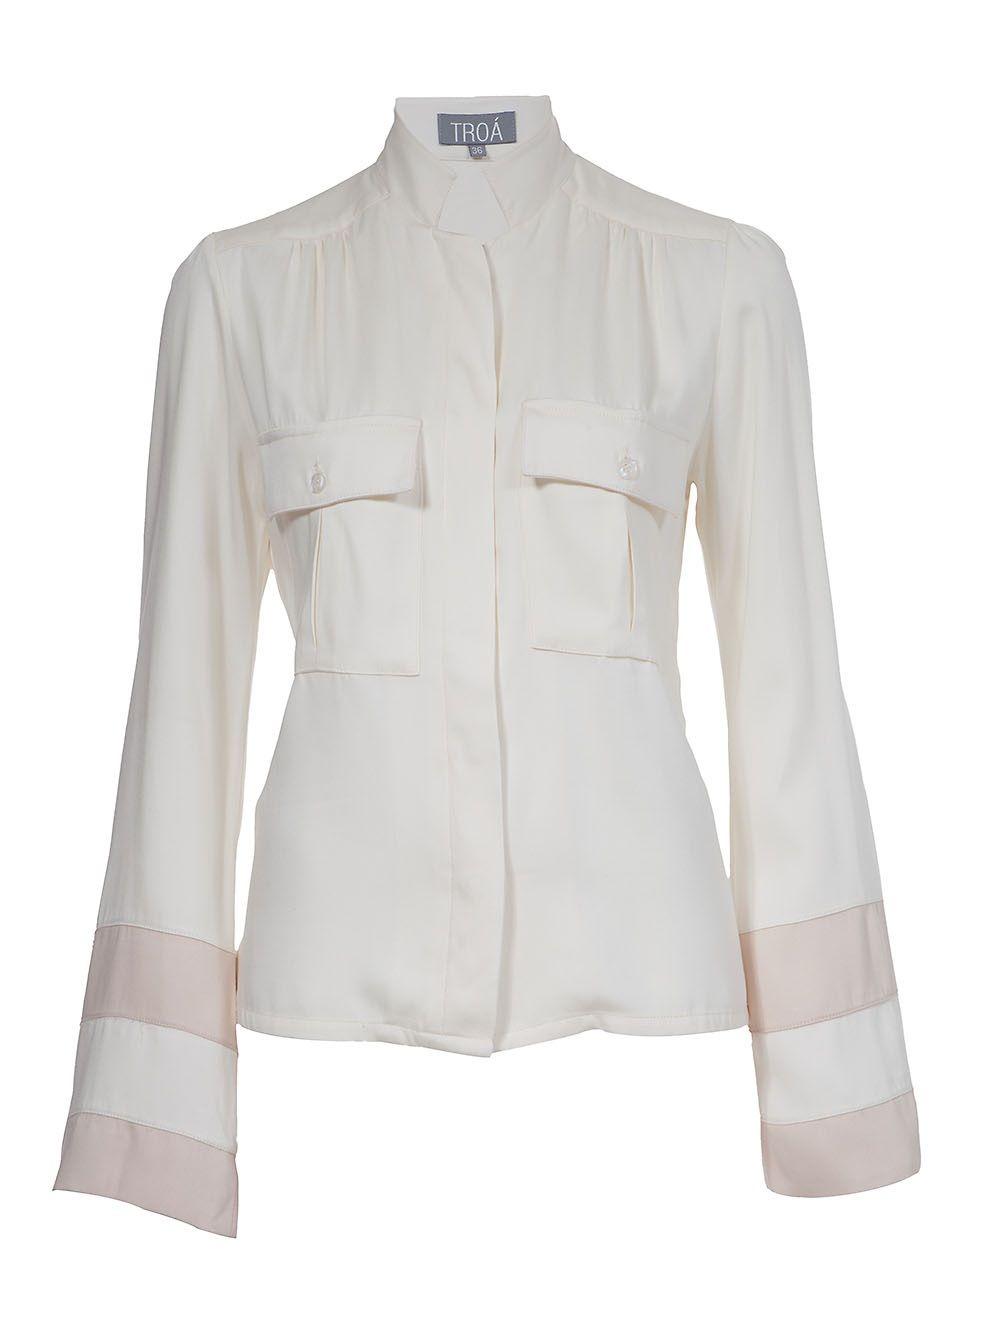 Troá Camisa Off White. - Troá - farfetch.com.br